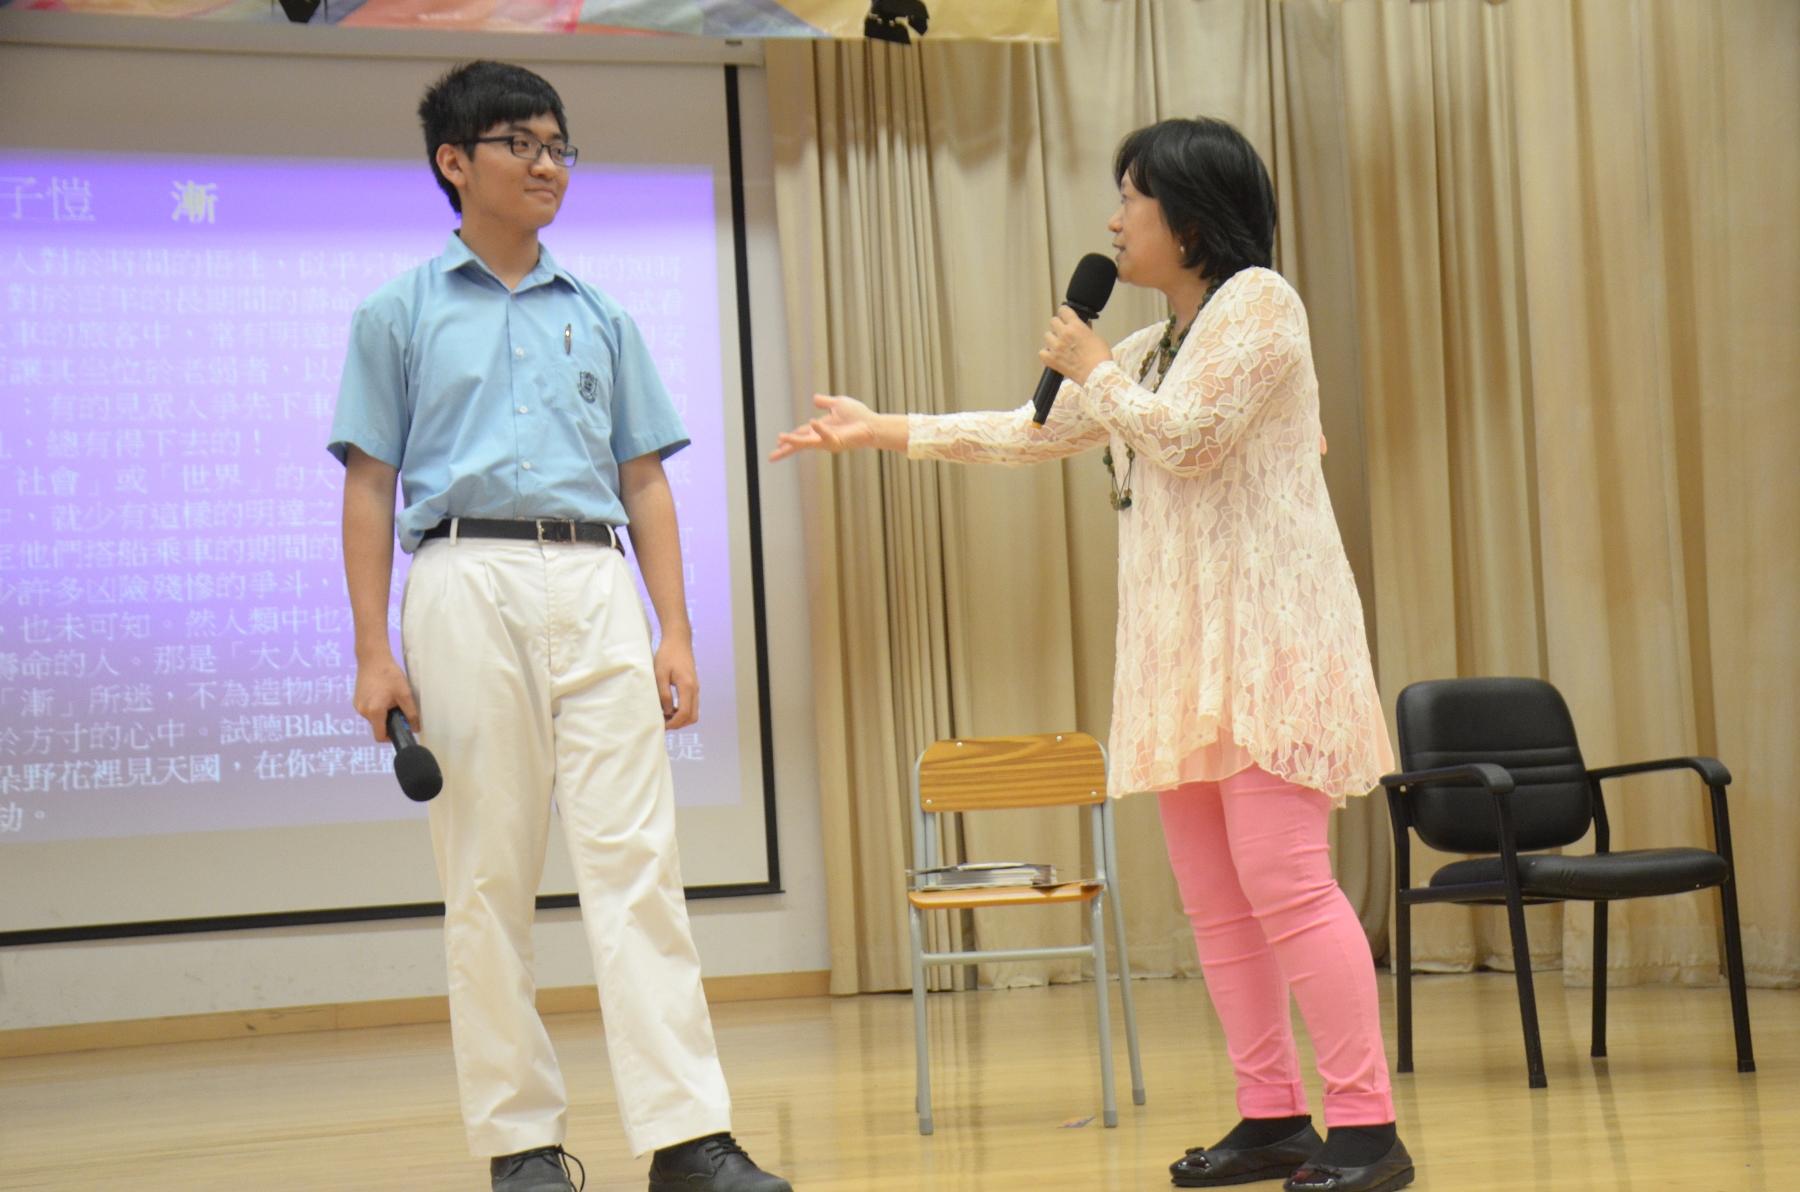 http://npc.edu.hk/sites/default/files/dsc_2531.jpg